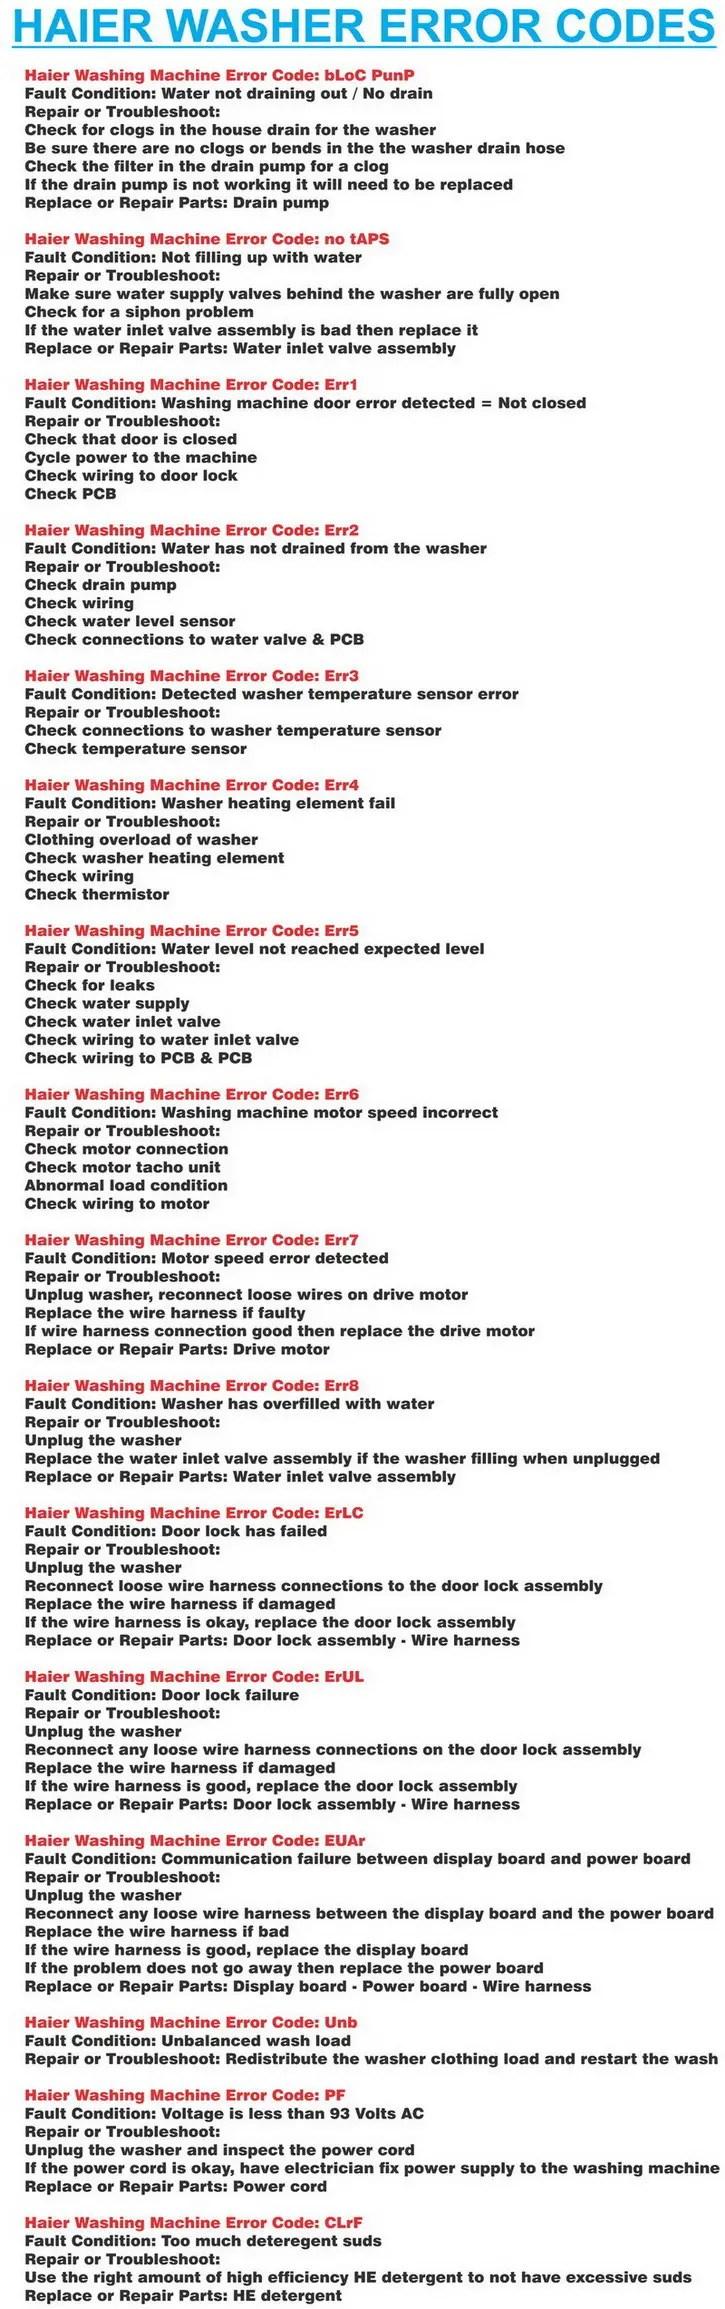 Haier Washing Machine Wiring Diagram | Online Wiring Diagram on estate wiring diagram, roper wiring diagram, sears wiring diagram, crosley wiring diagram, broan wiring diagram, o2 wiring diagram, benq wiring diagram, midea wiring diagram, braun wiring diagram, panasonic wiring diagram, apple wiring diagram, apc wiring diagram, dcs wiring diagram, viking wiring diagram, danby wiring diagram, msi wiring diagram, toshiba wiring diagram, foscam wiring diagram, vivitar wiring diagram, manufacturing wiring diagram,